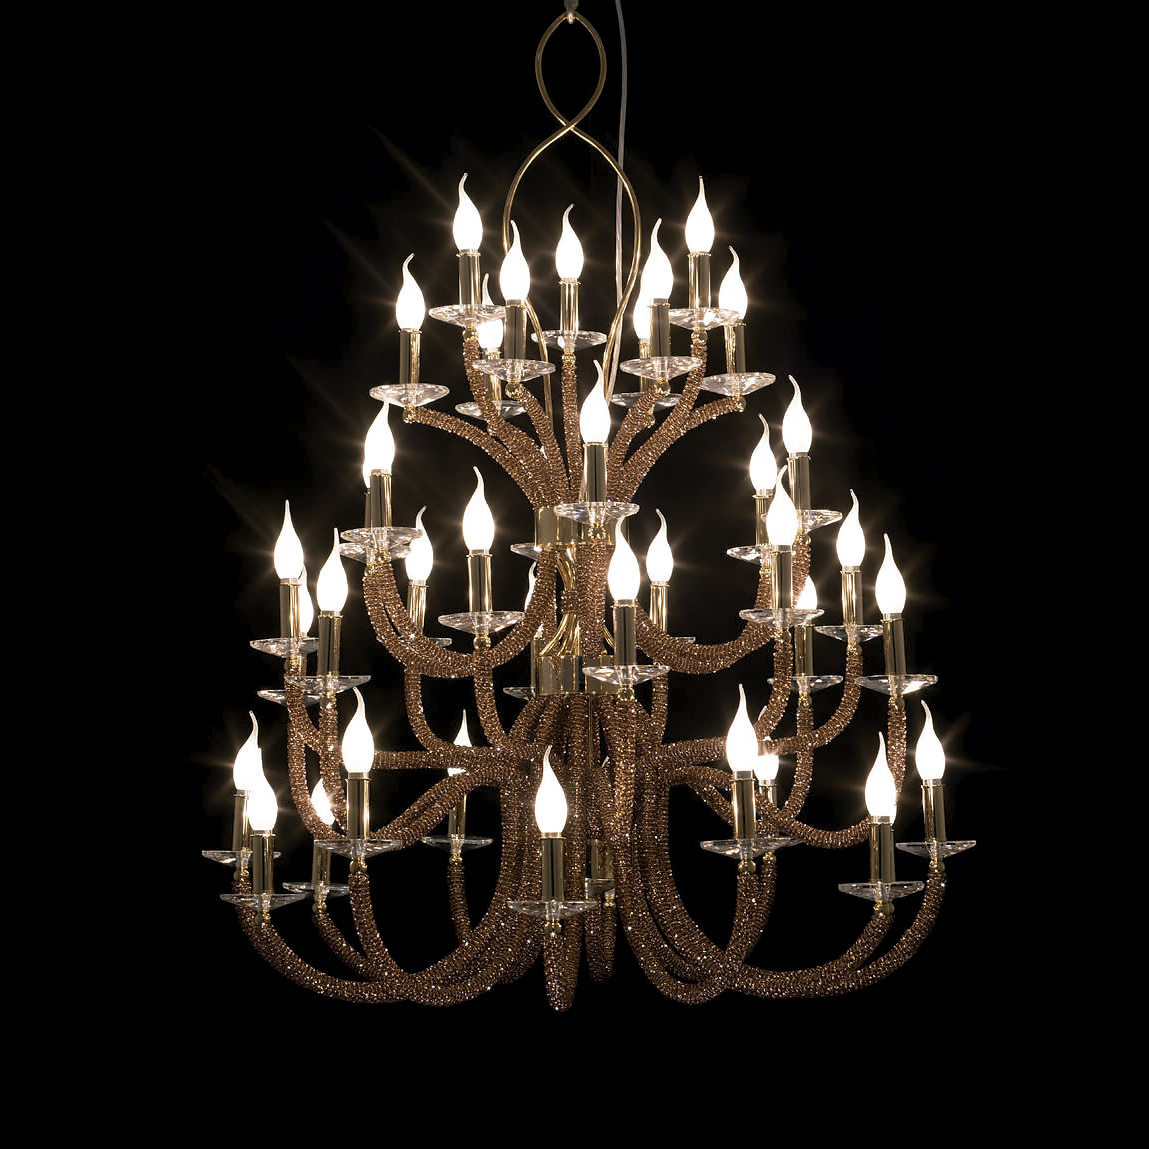 Luxury high end italian designer moulin rouge chandelier designer moulin rouge chandelier aloadofball Choice Image